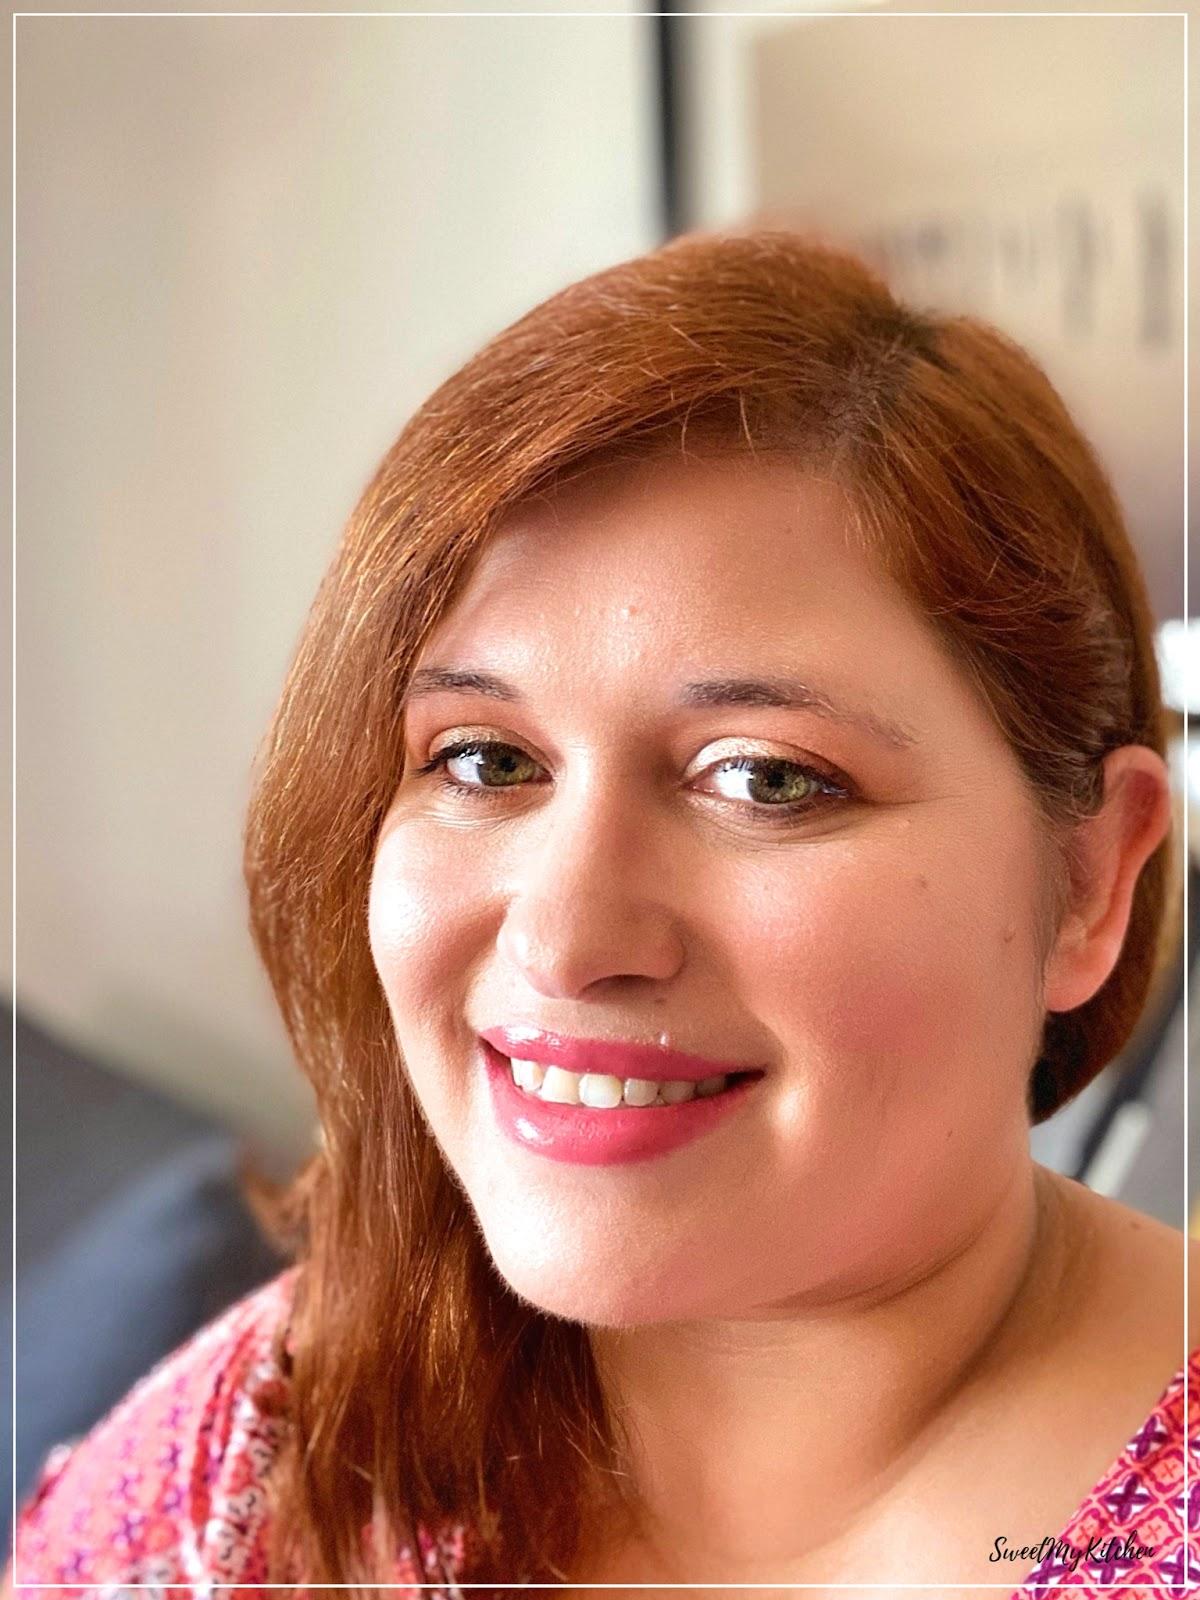 Makeup Revolution Pout Bomb Peachy Marisa Valadas